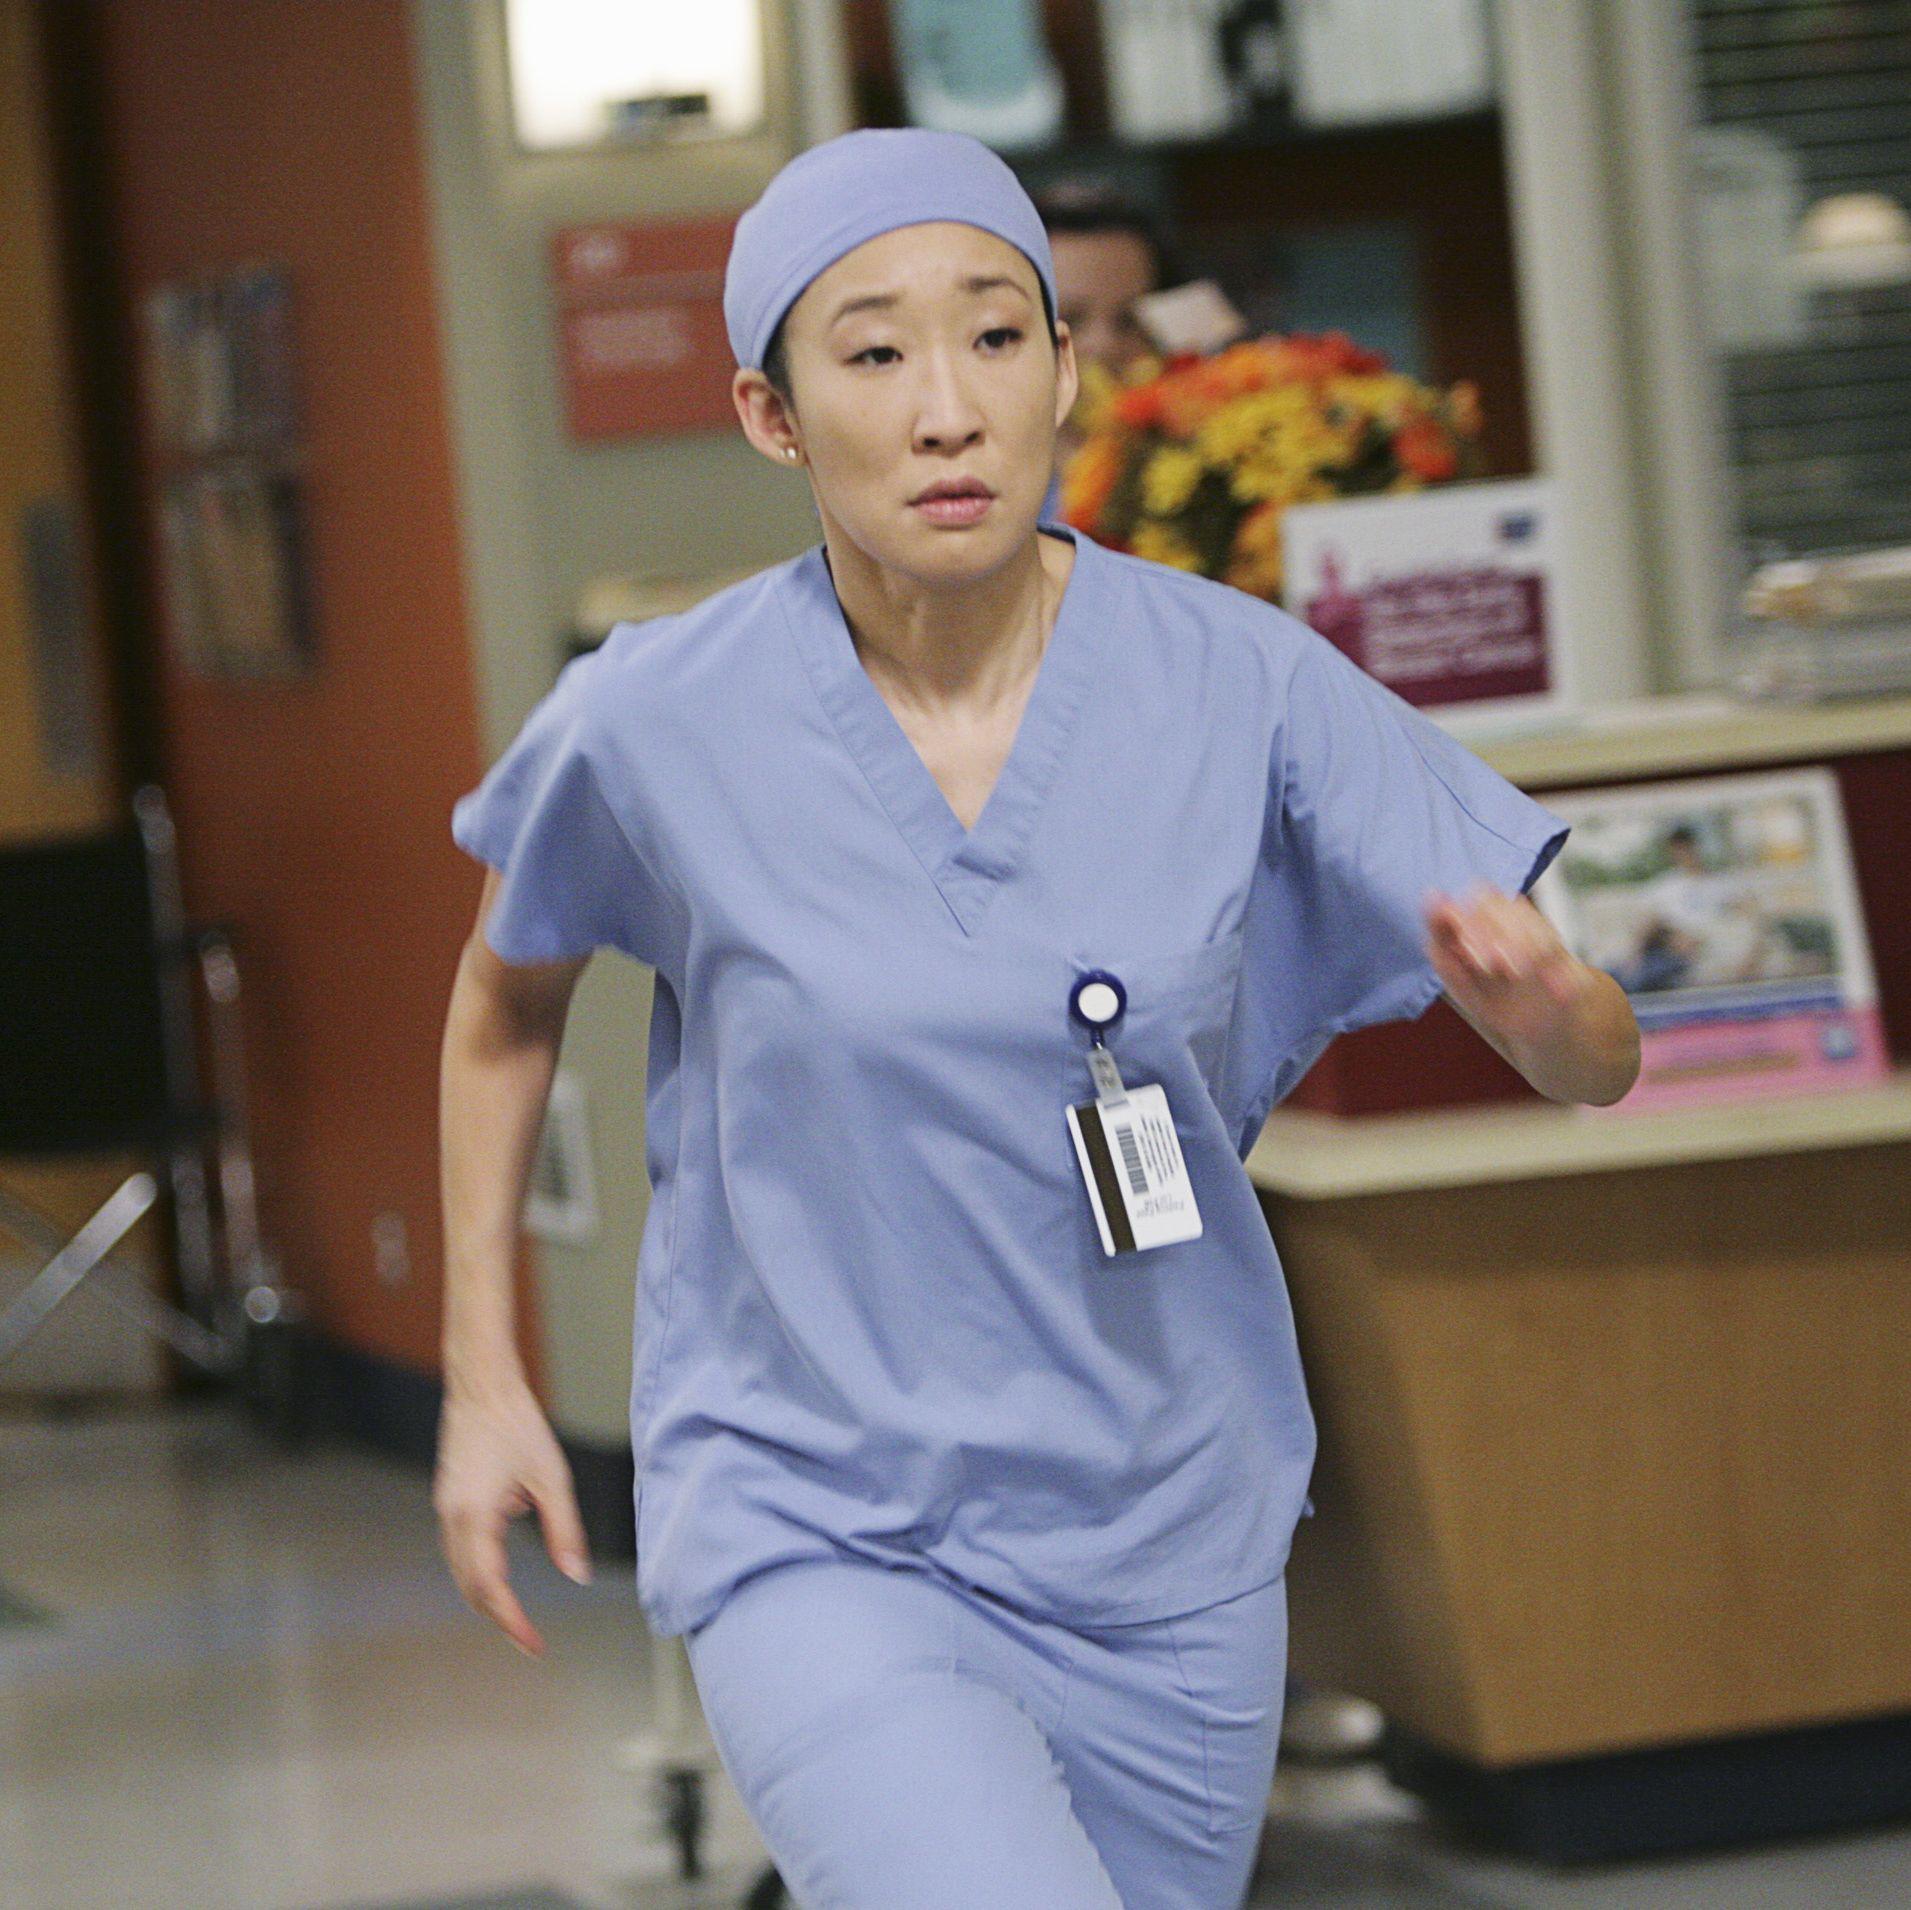 Real doctors debunk the clichés of TV medical dramas